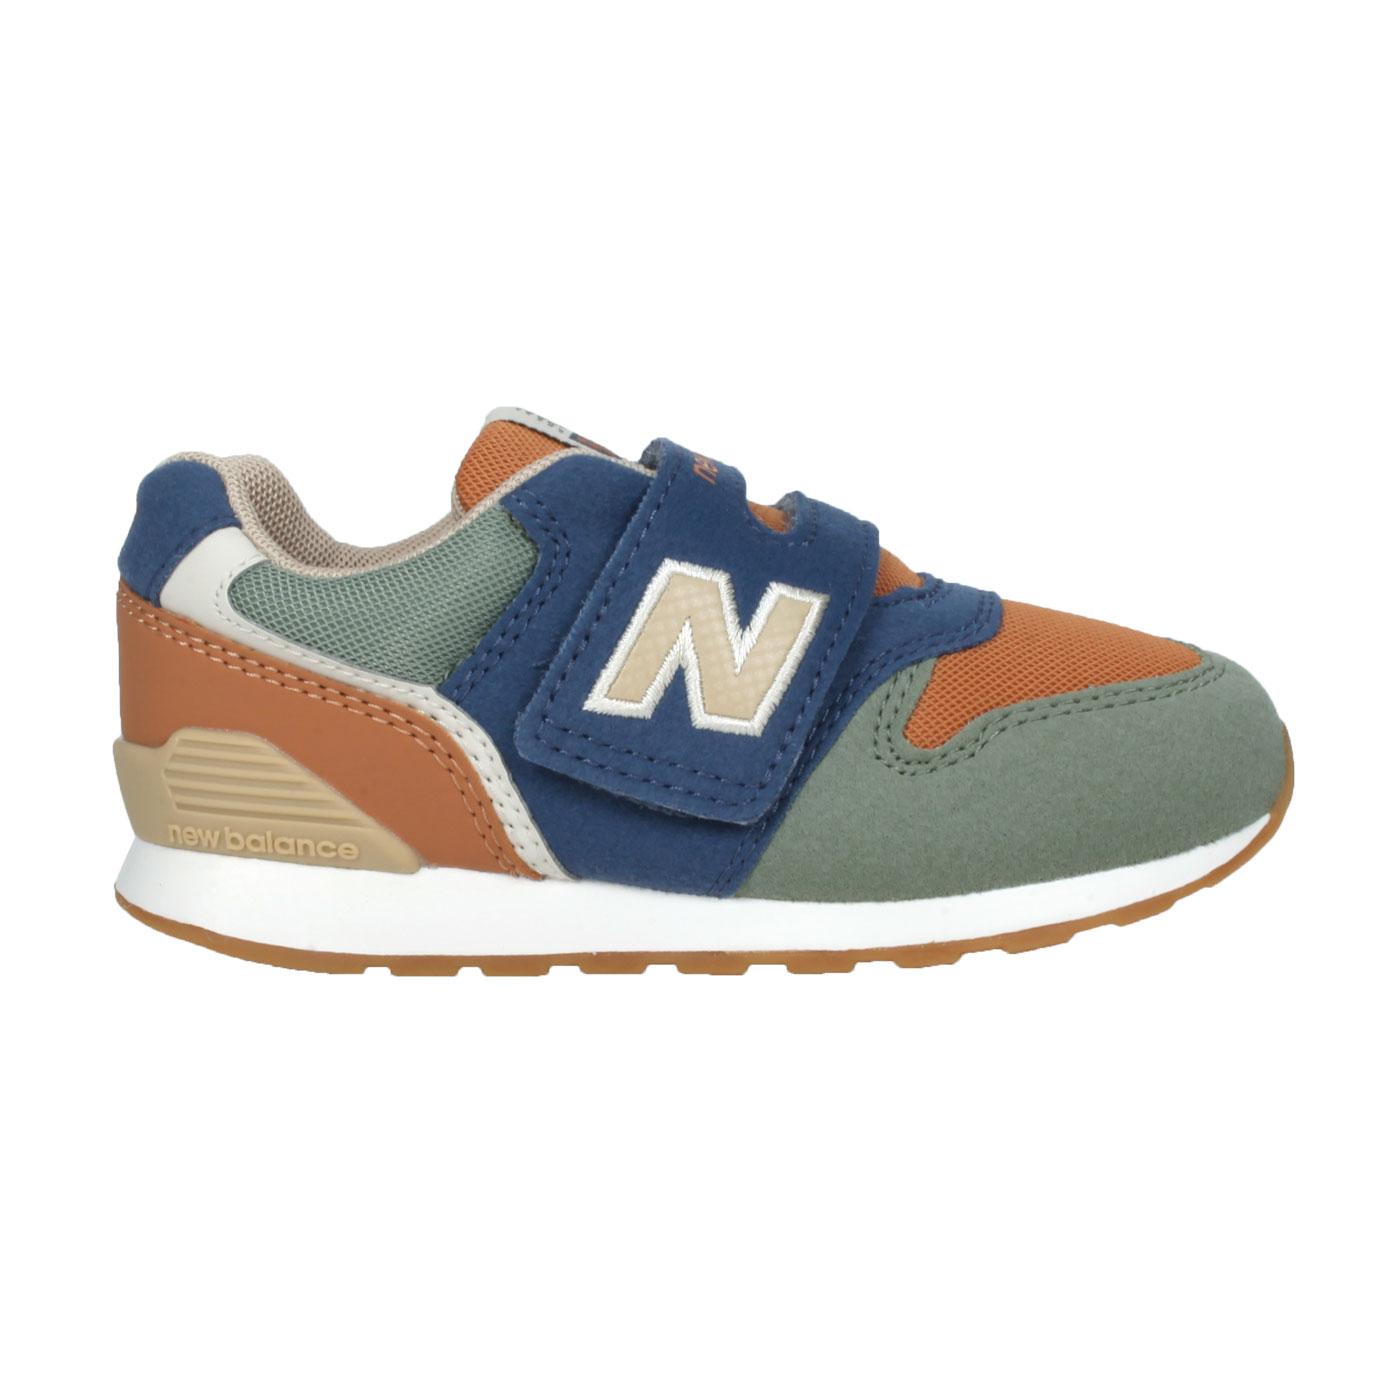 NEW BALANCE 小童休閒運動鞋-WIDE IZ996ON3 - 藍綠棕